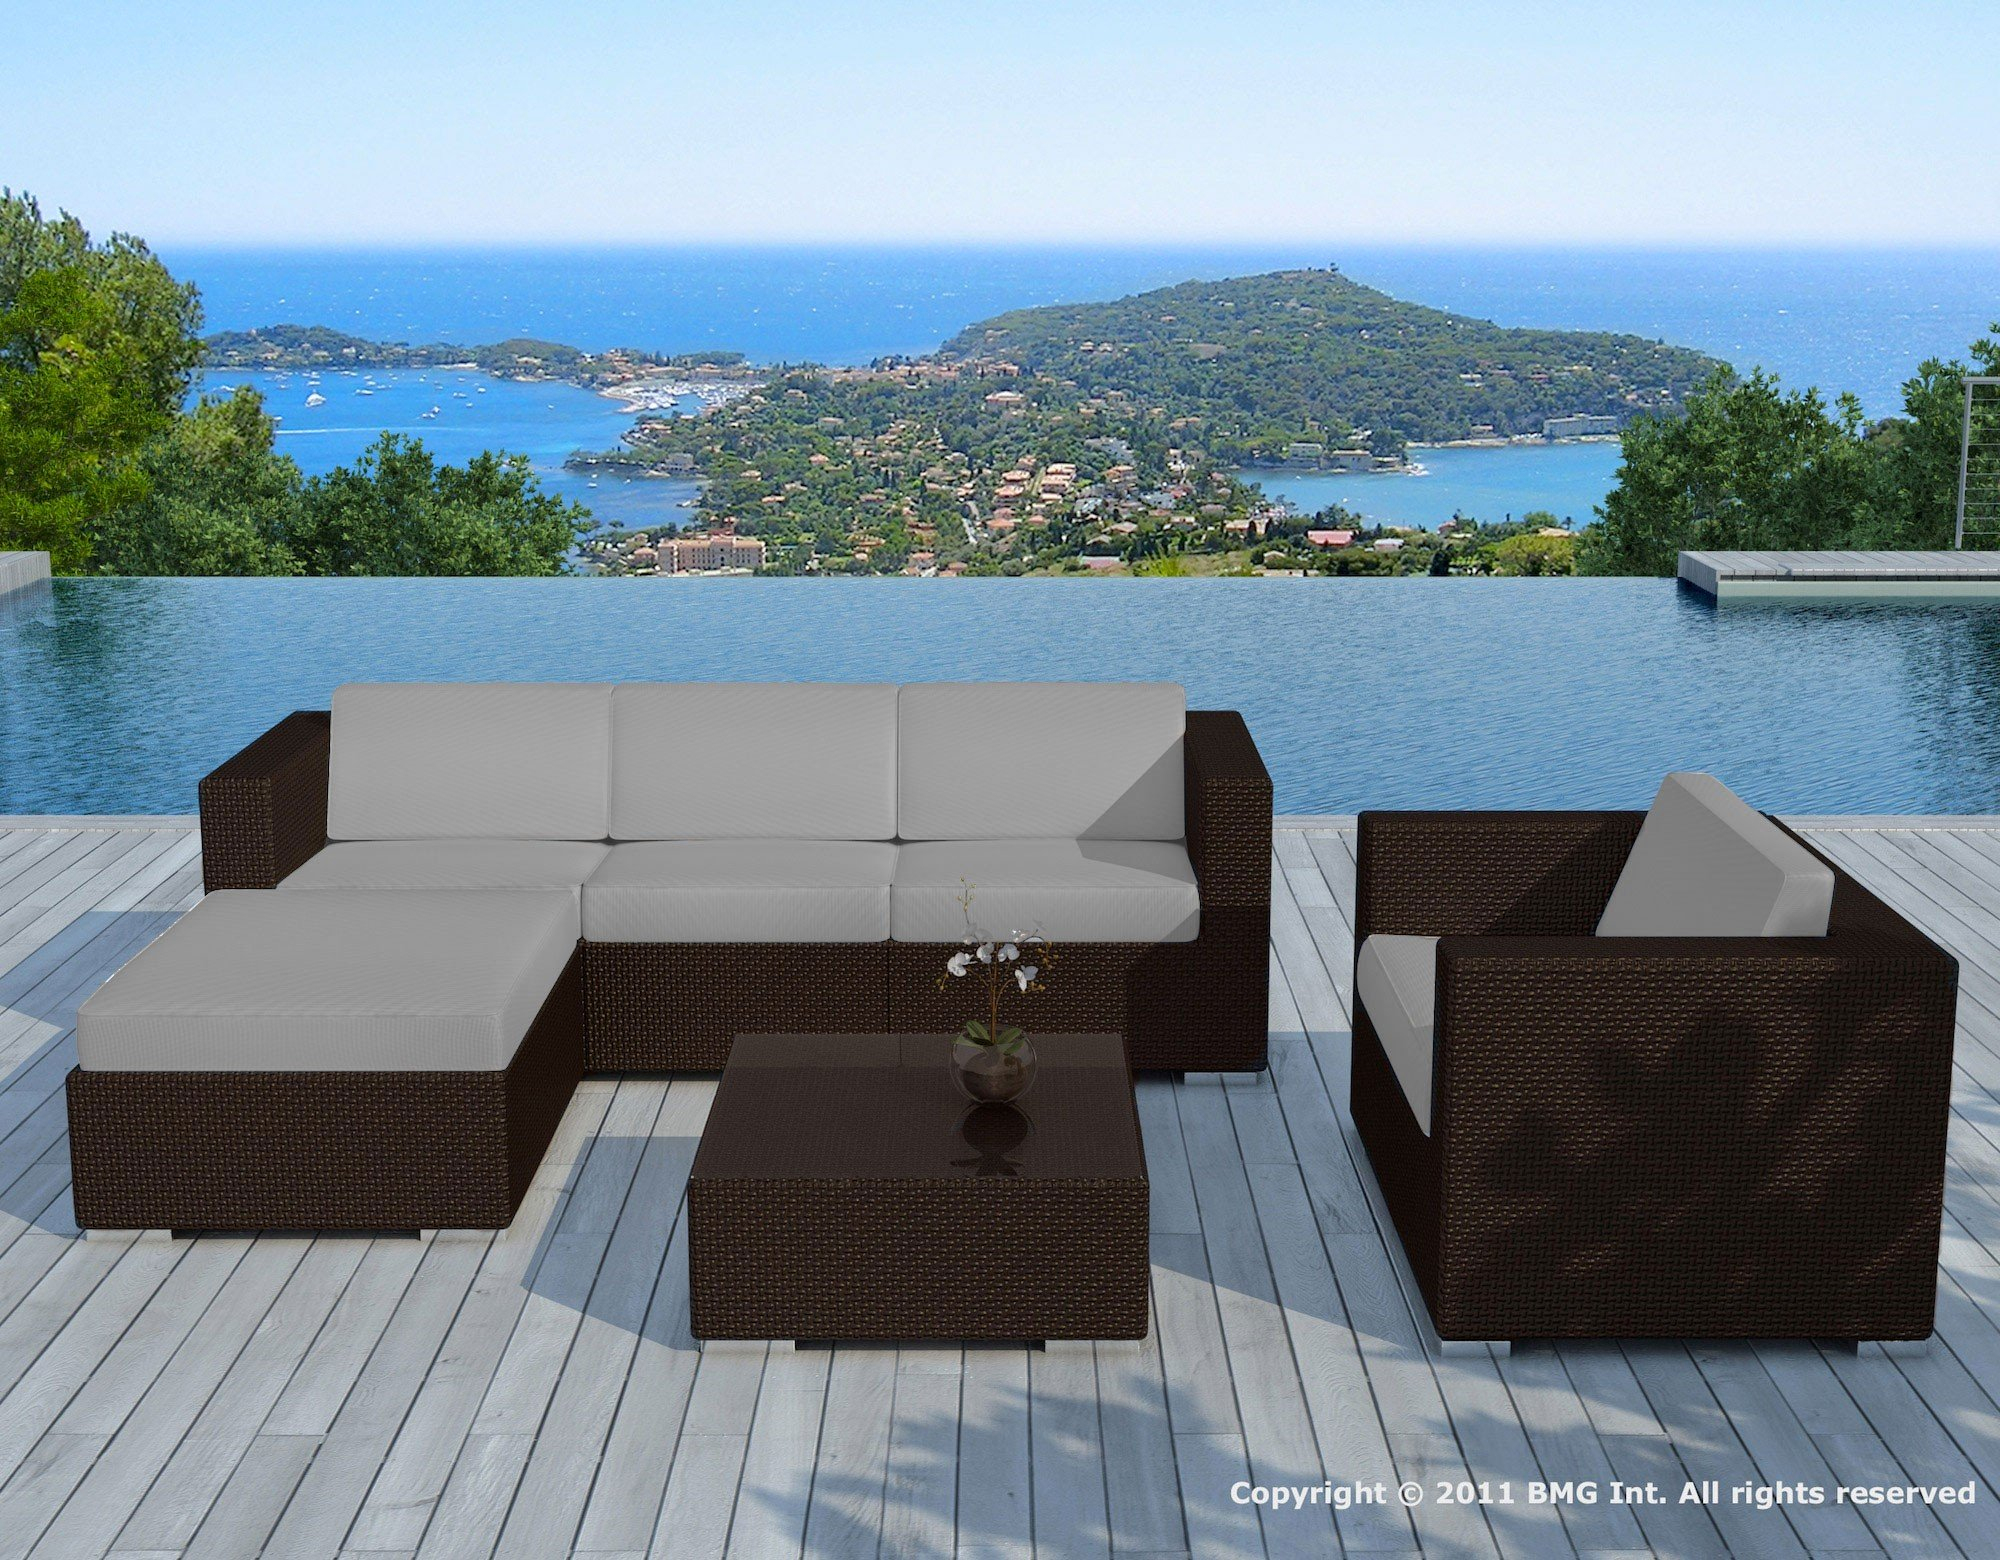 Salon De Jardin Resine Chocolat/gris - Copacabana - Delorm Design encequiconcerne Salon De Jardin Haut De Gamme